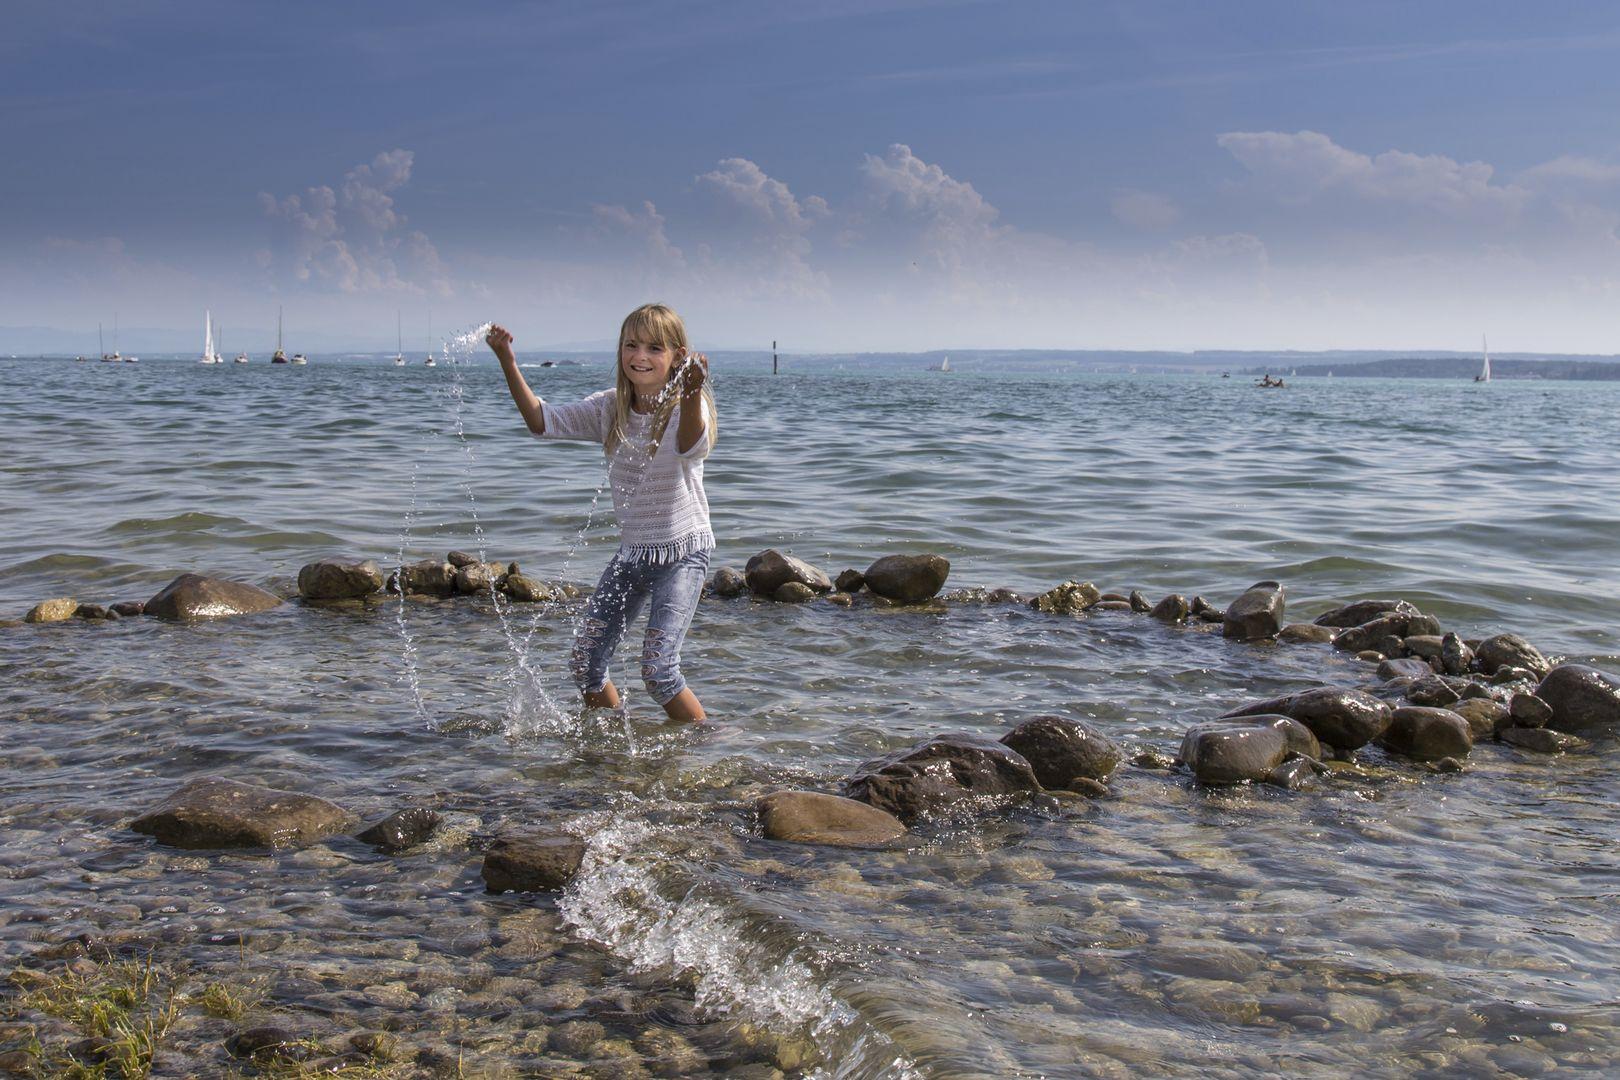 Sommer, Sonne, Bodensee! - Annelore Meissner-Müller